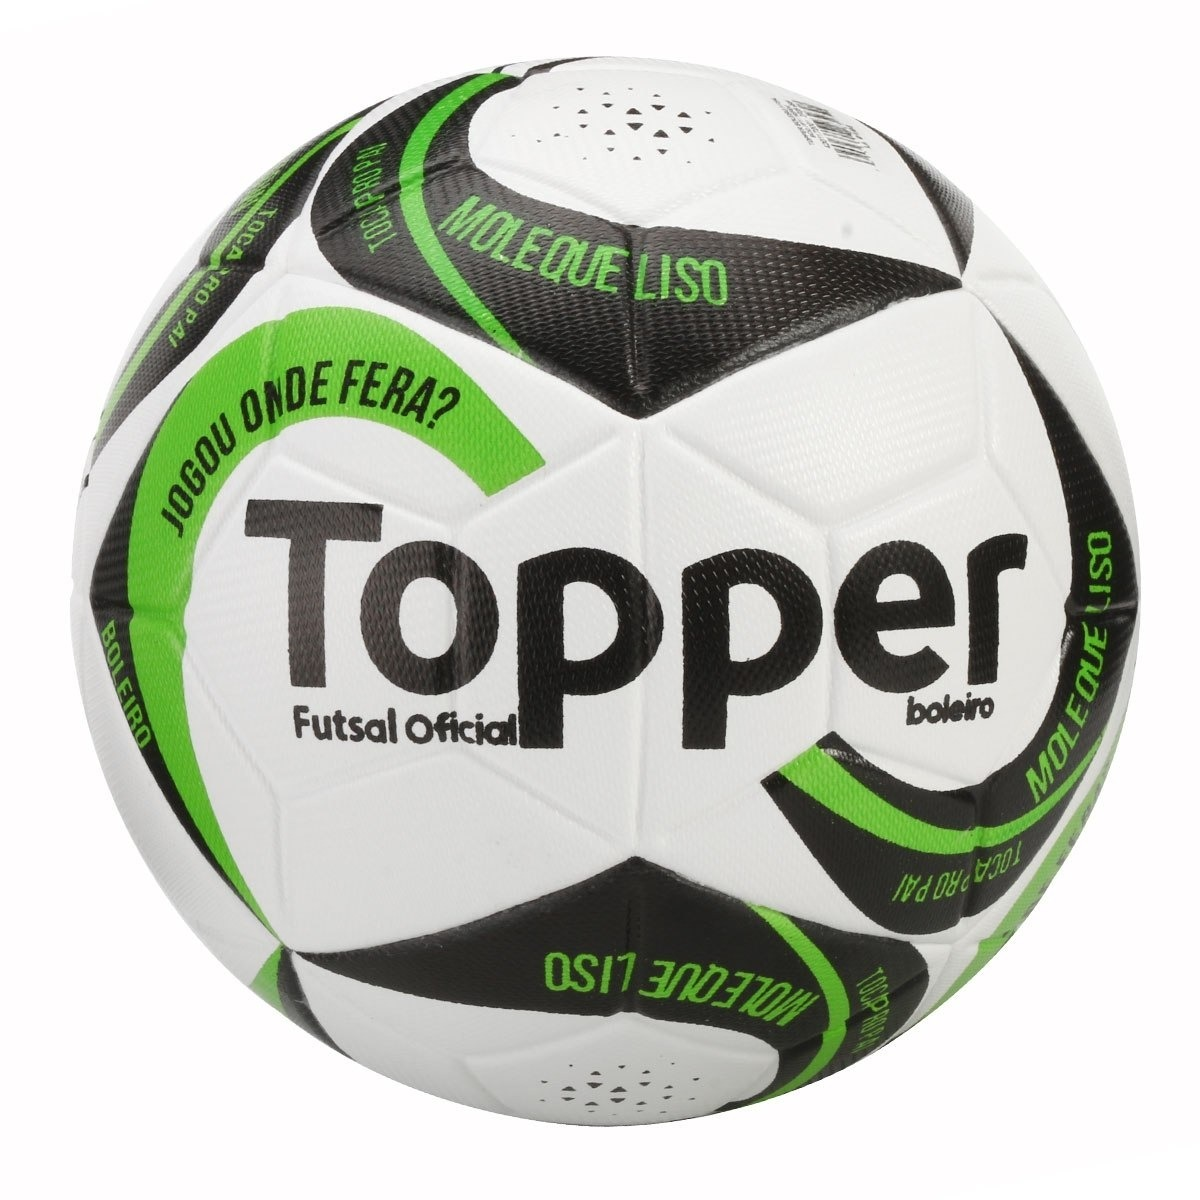 75a821df17 Caixa C 10 Bolas Futsal Oficial Topper Boleiro - R  696